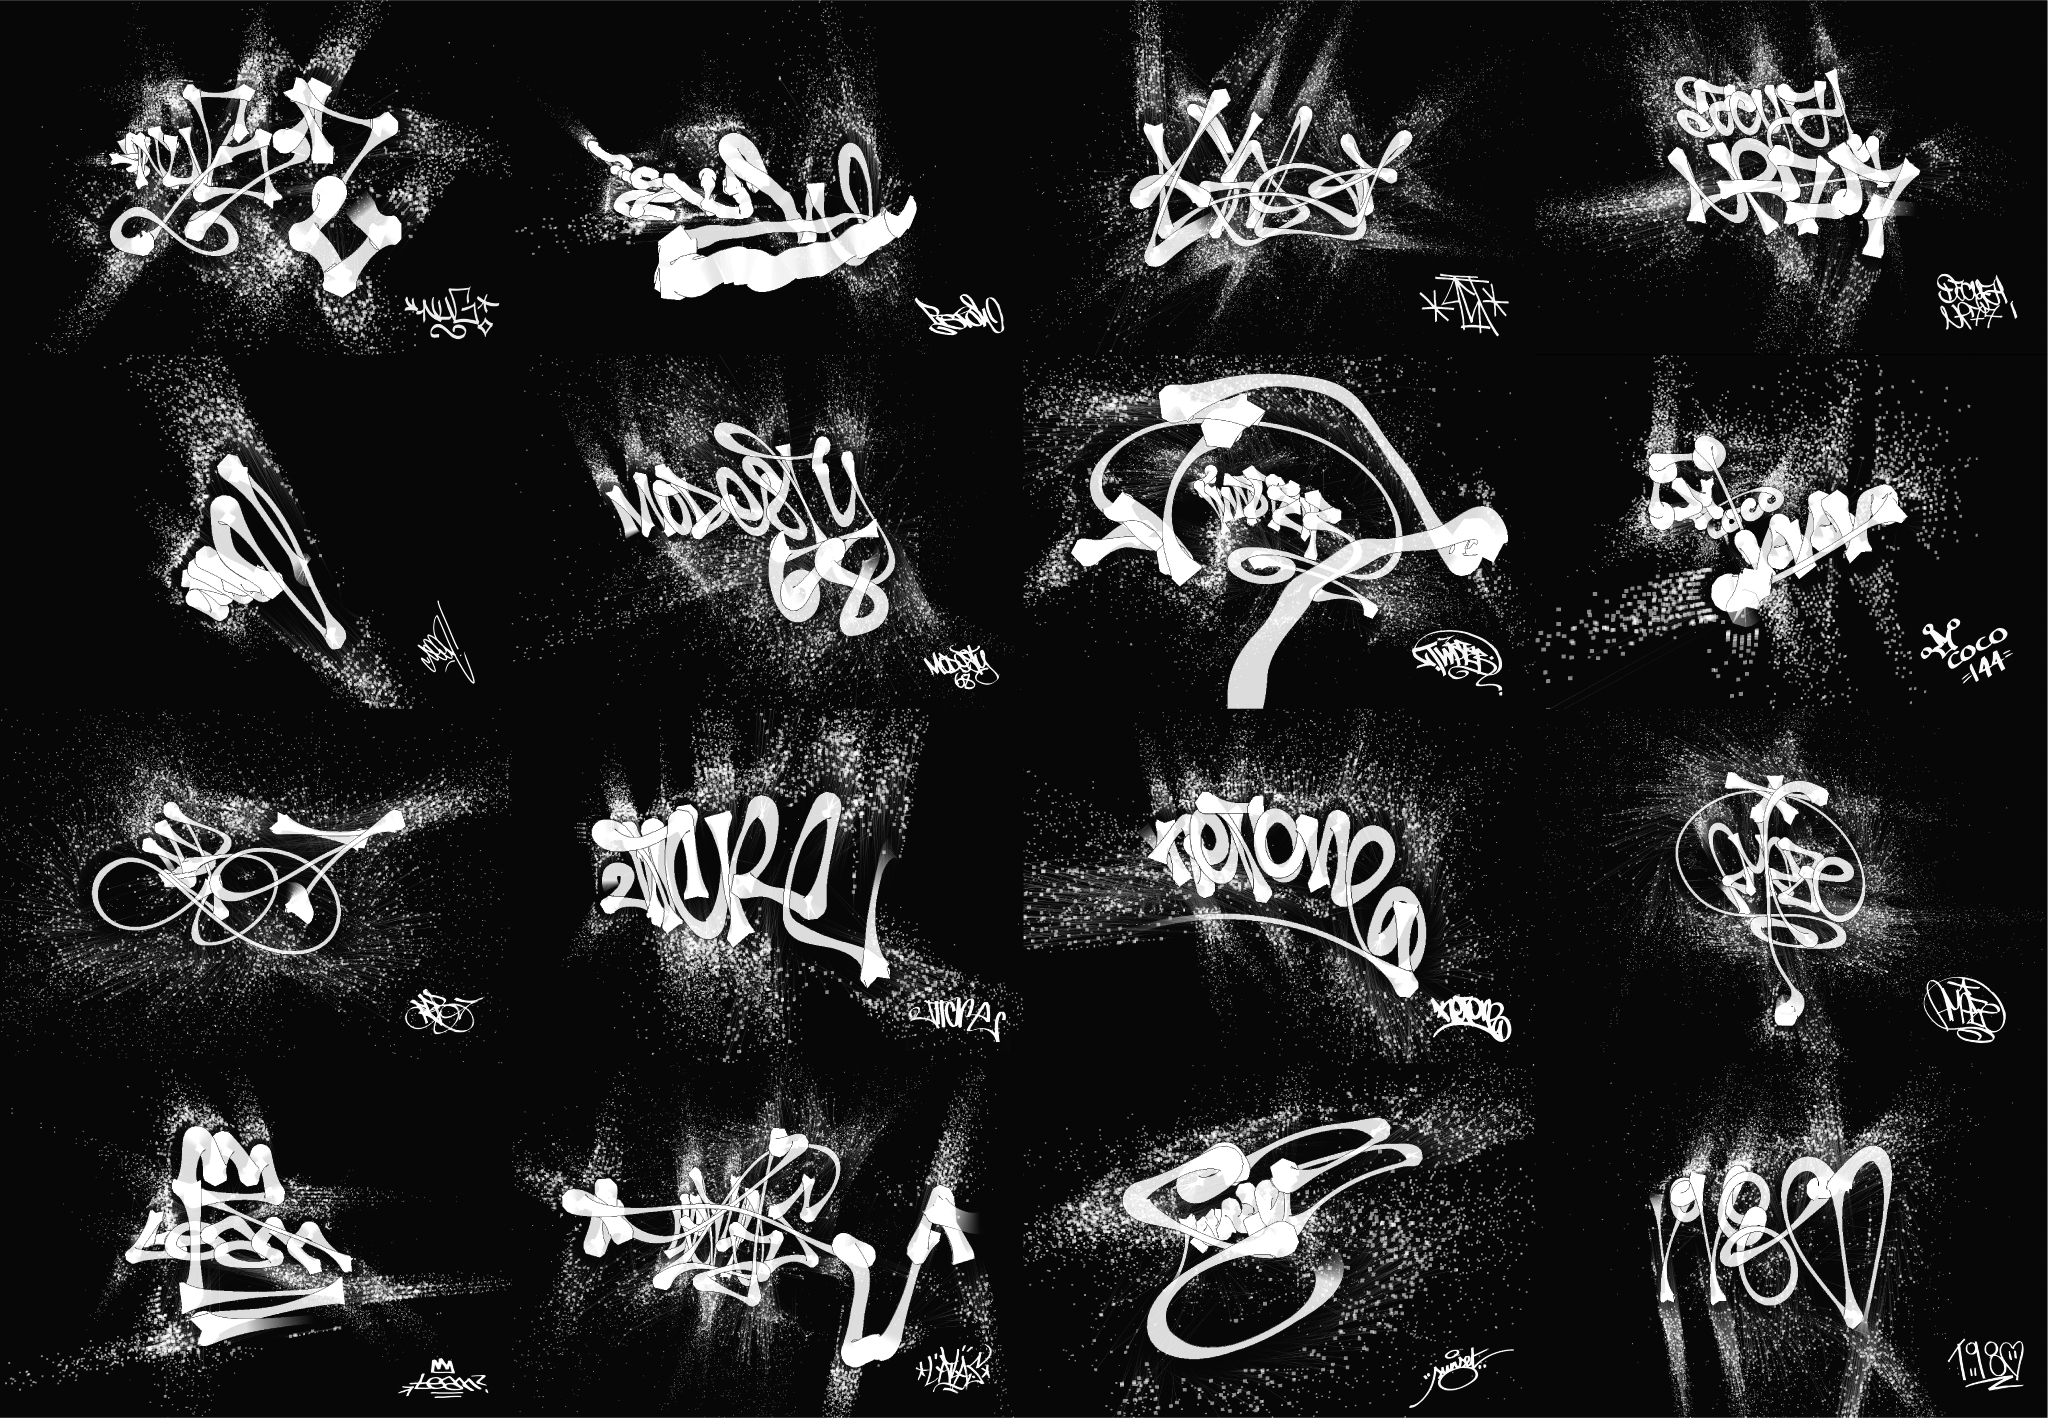 Graffiti Analysis